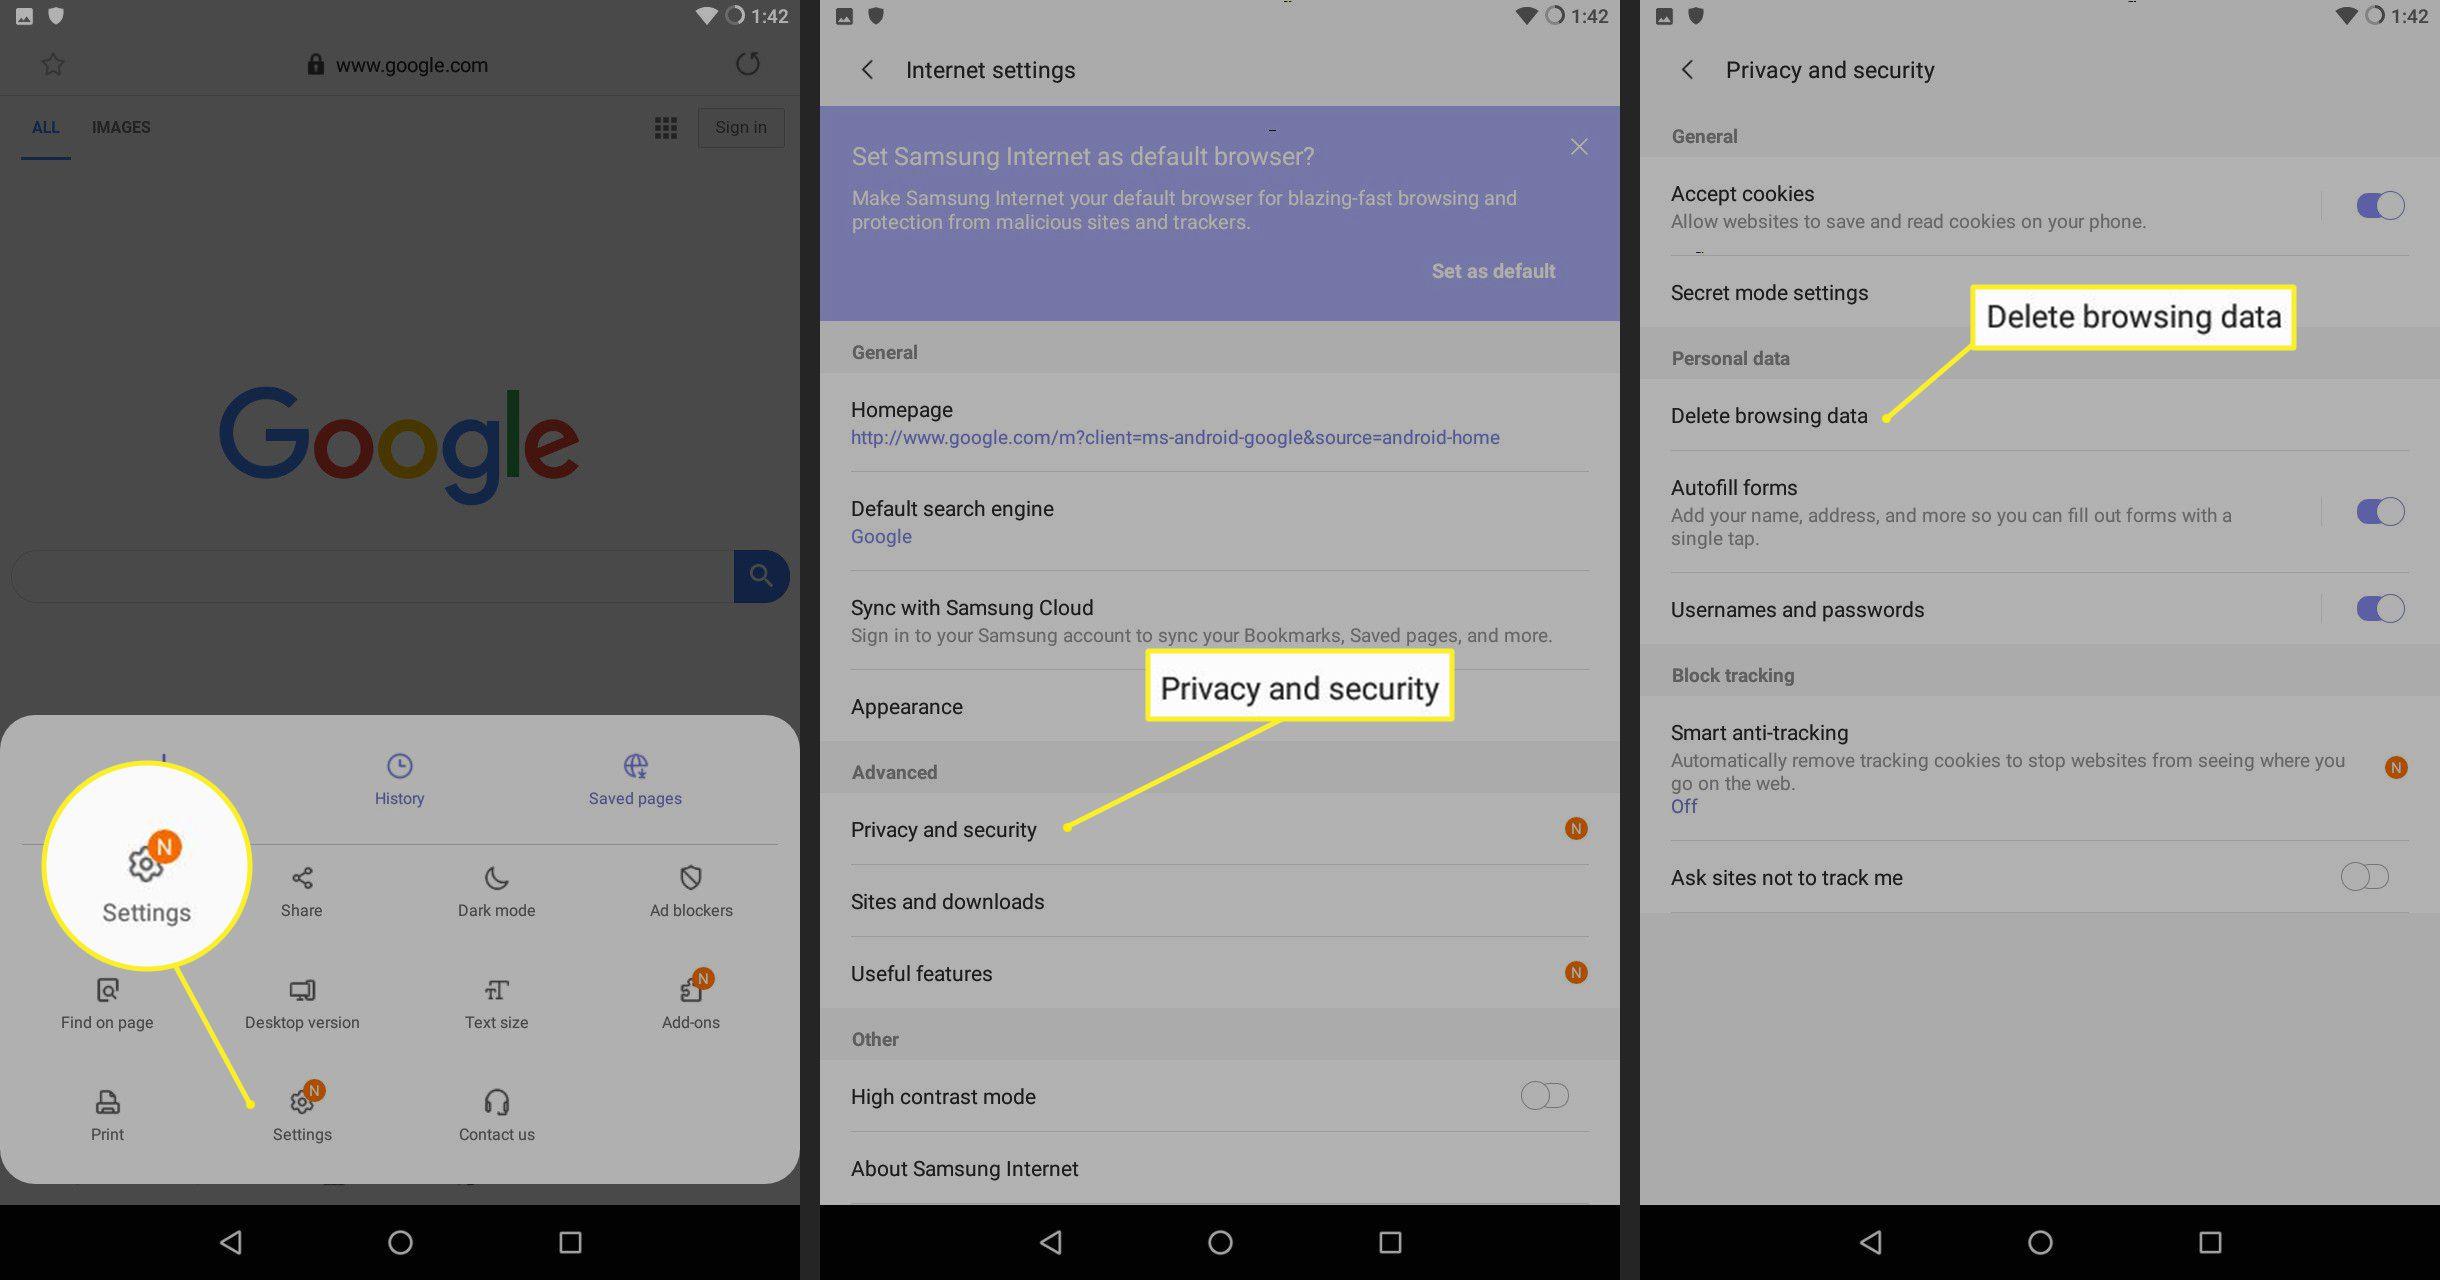 Delete browsing data on Samsung